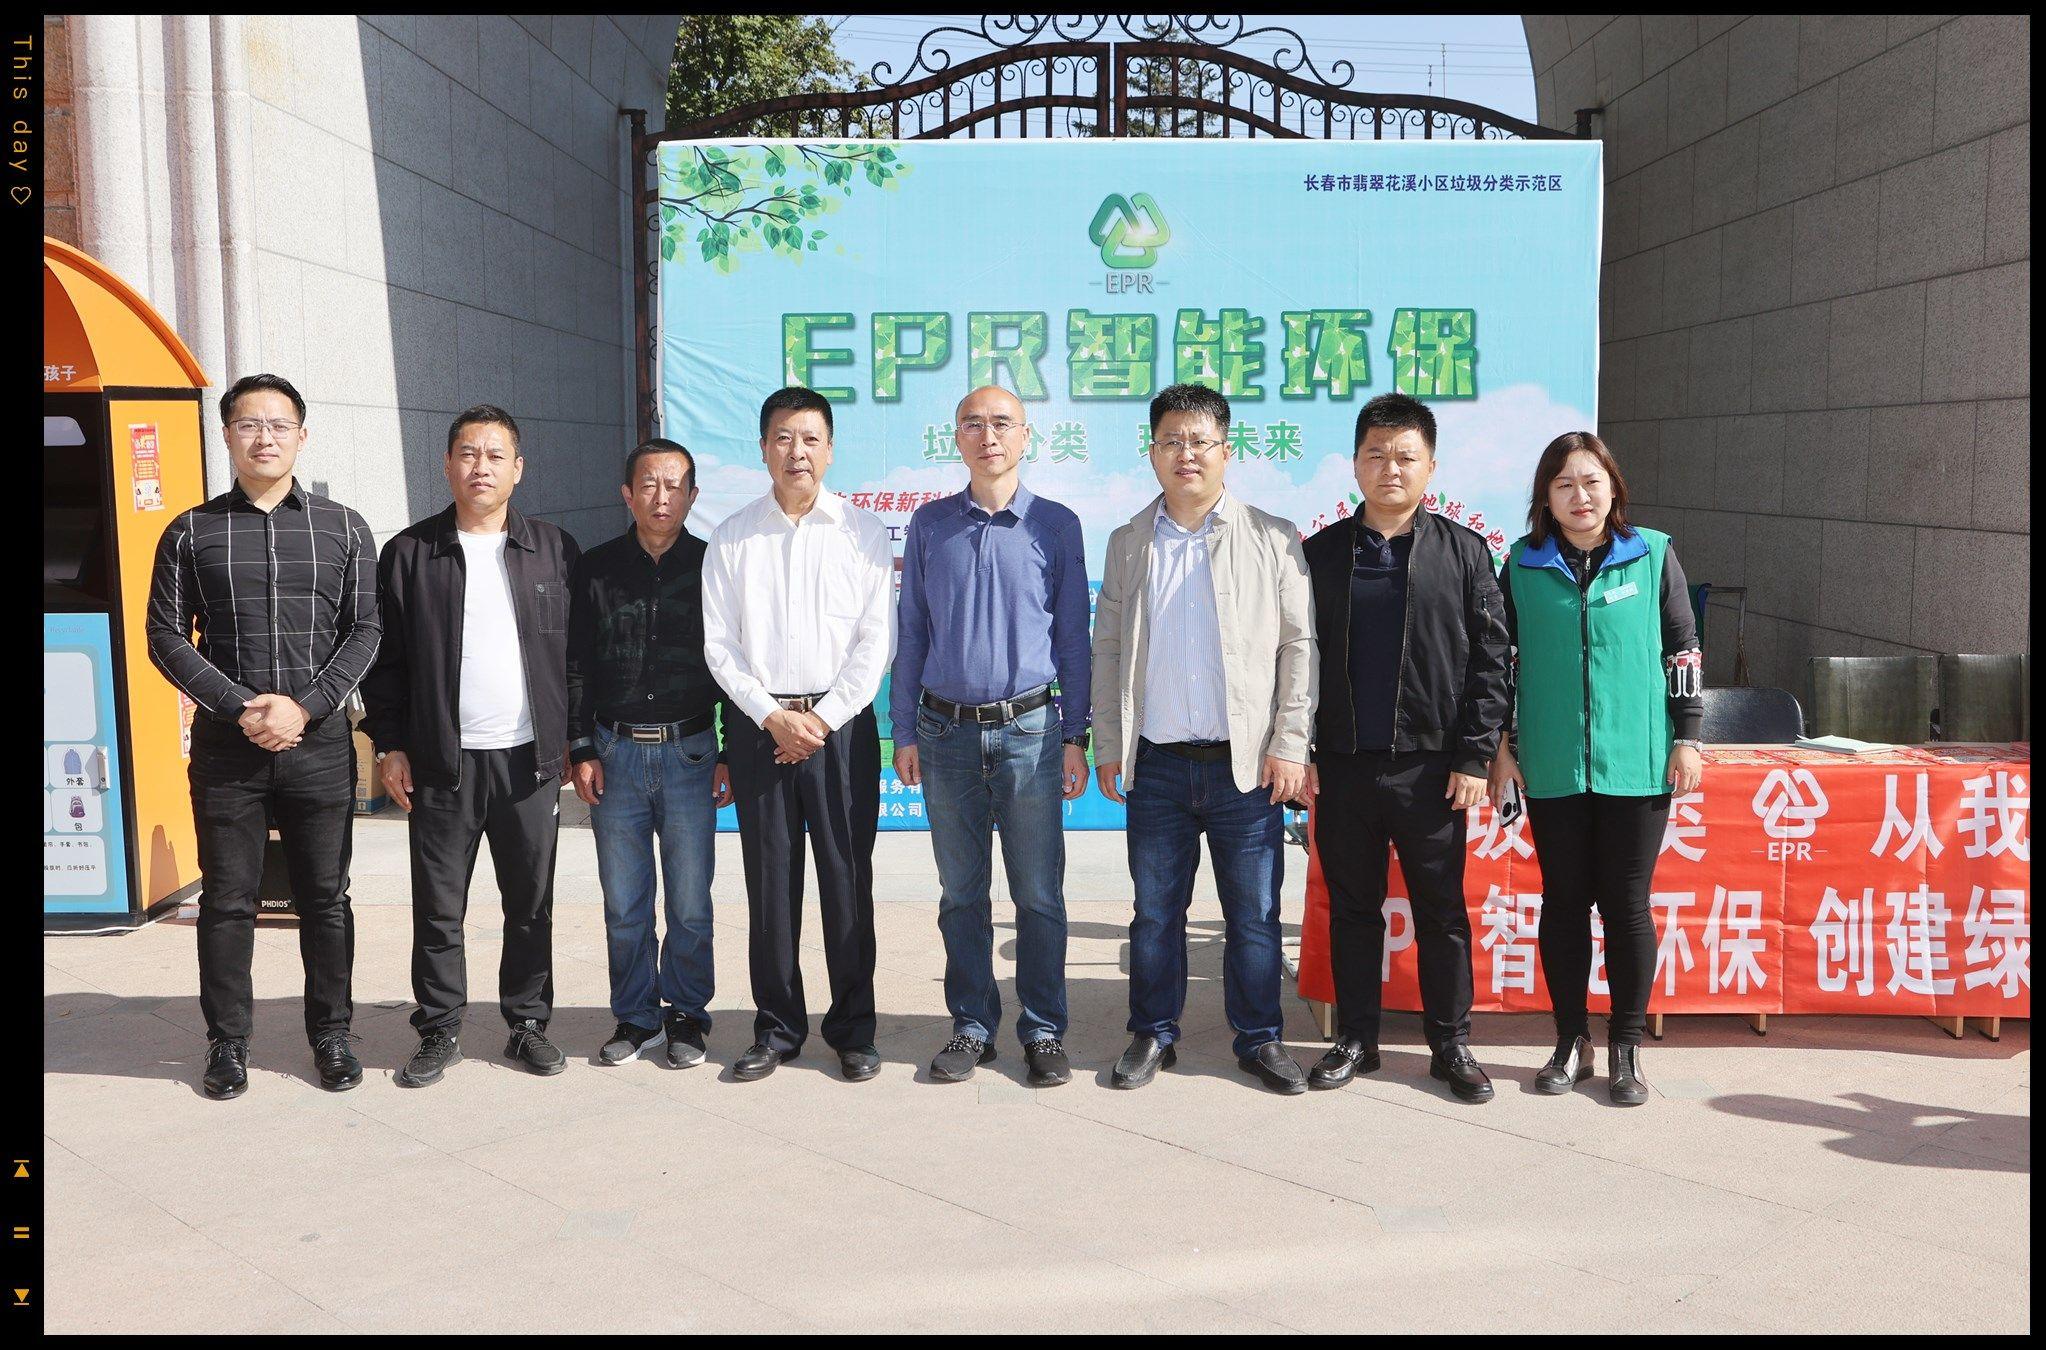 EPR智能环保行-翡翠花溪小区